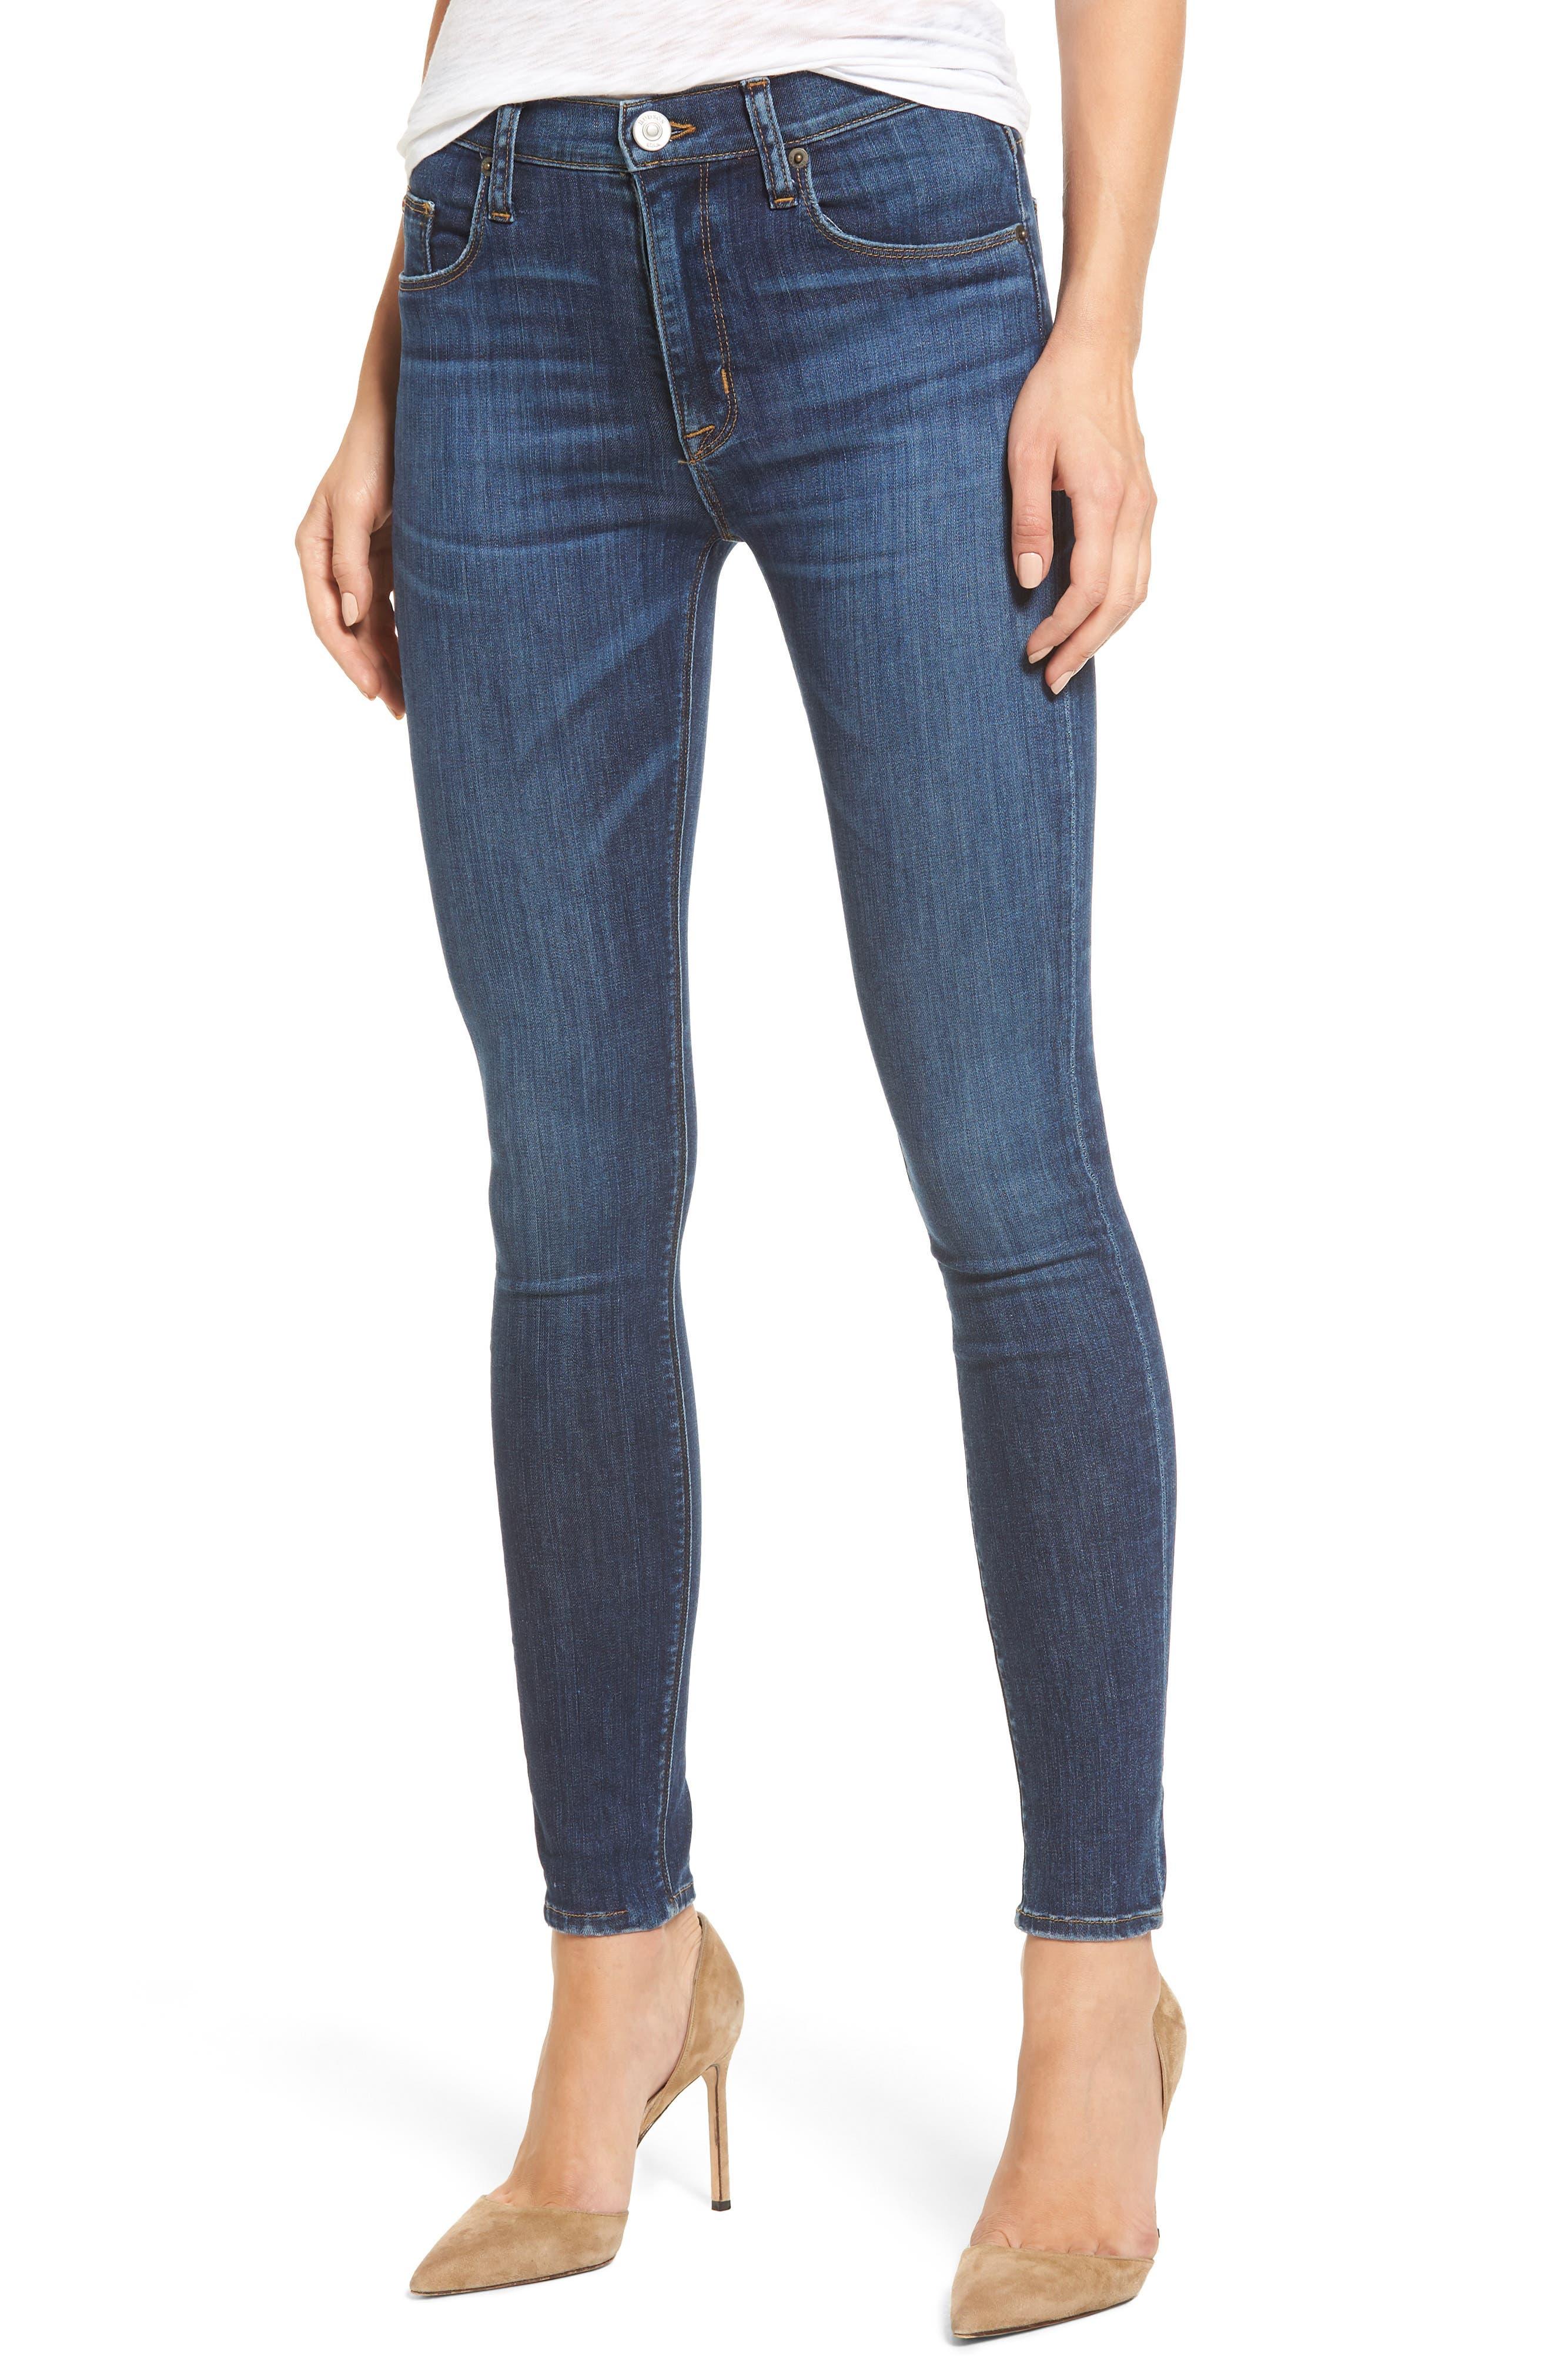 Main Image - Hudson Jeans 'Barbara' High Rise Super Skinny Jeans (Dream On)